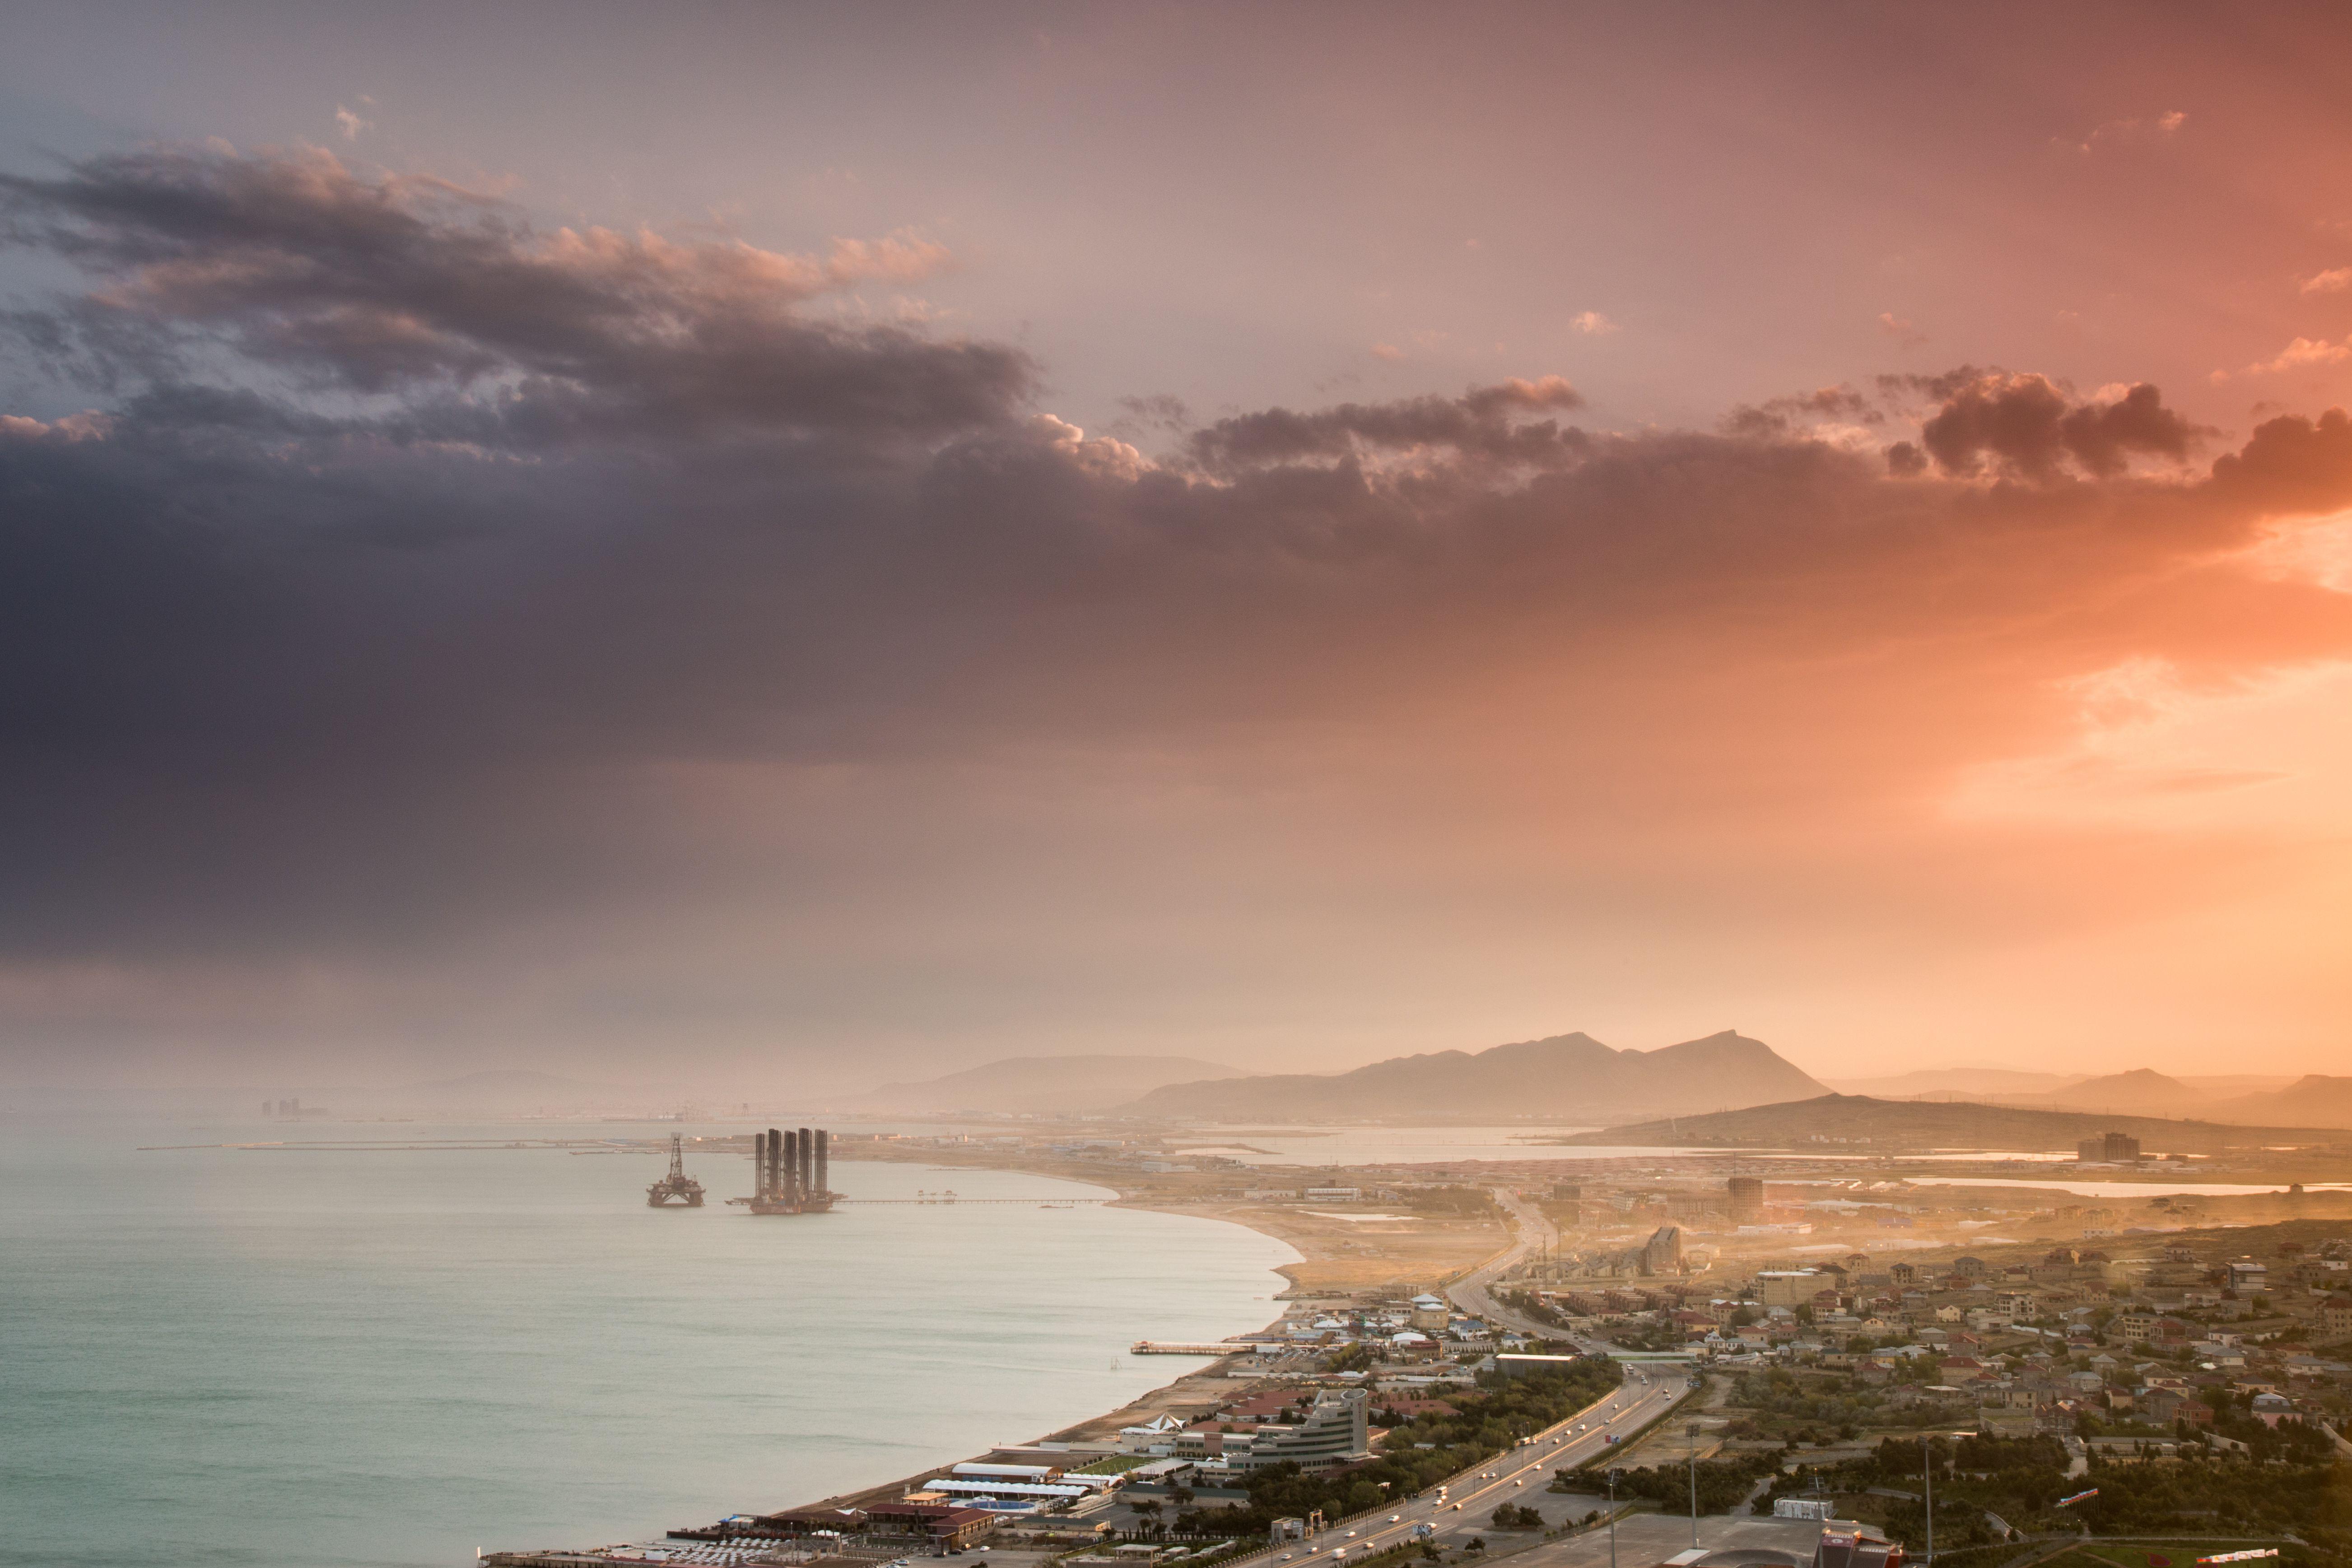 Shikhovo and oil rigs on the Caspian Sea.